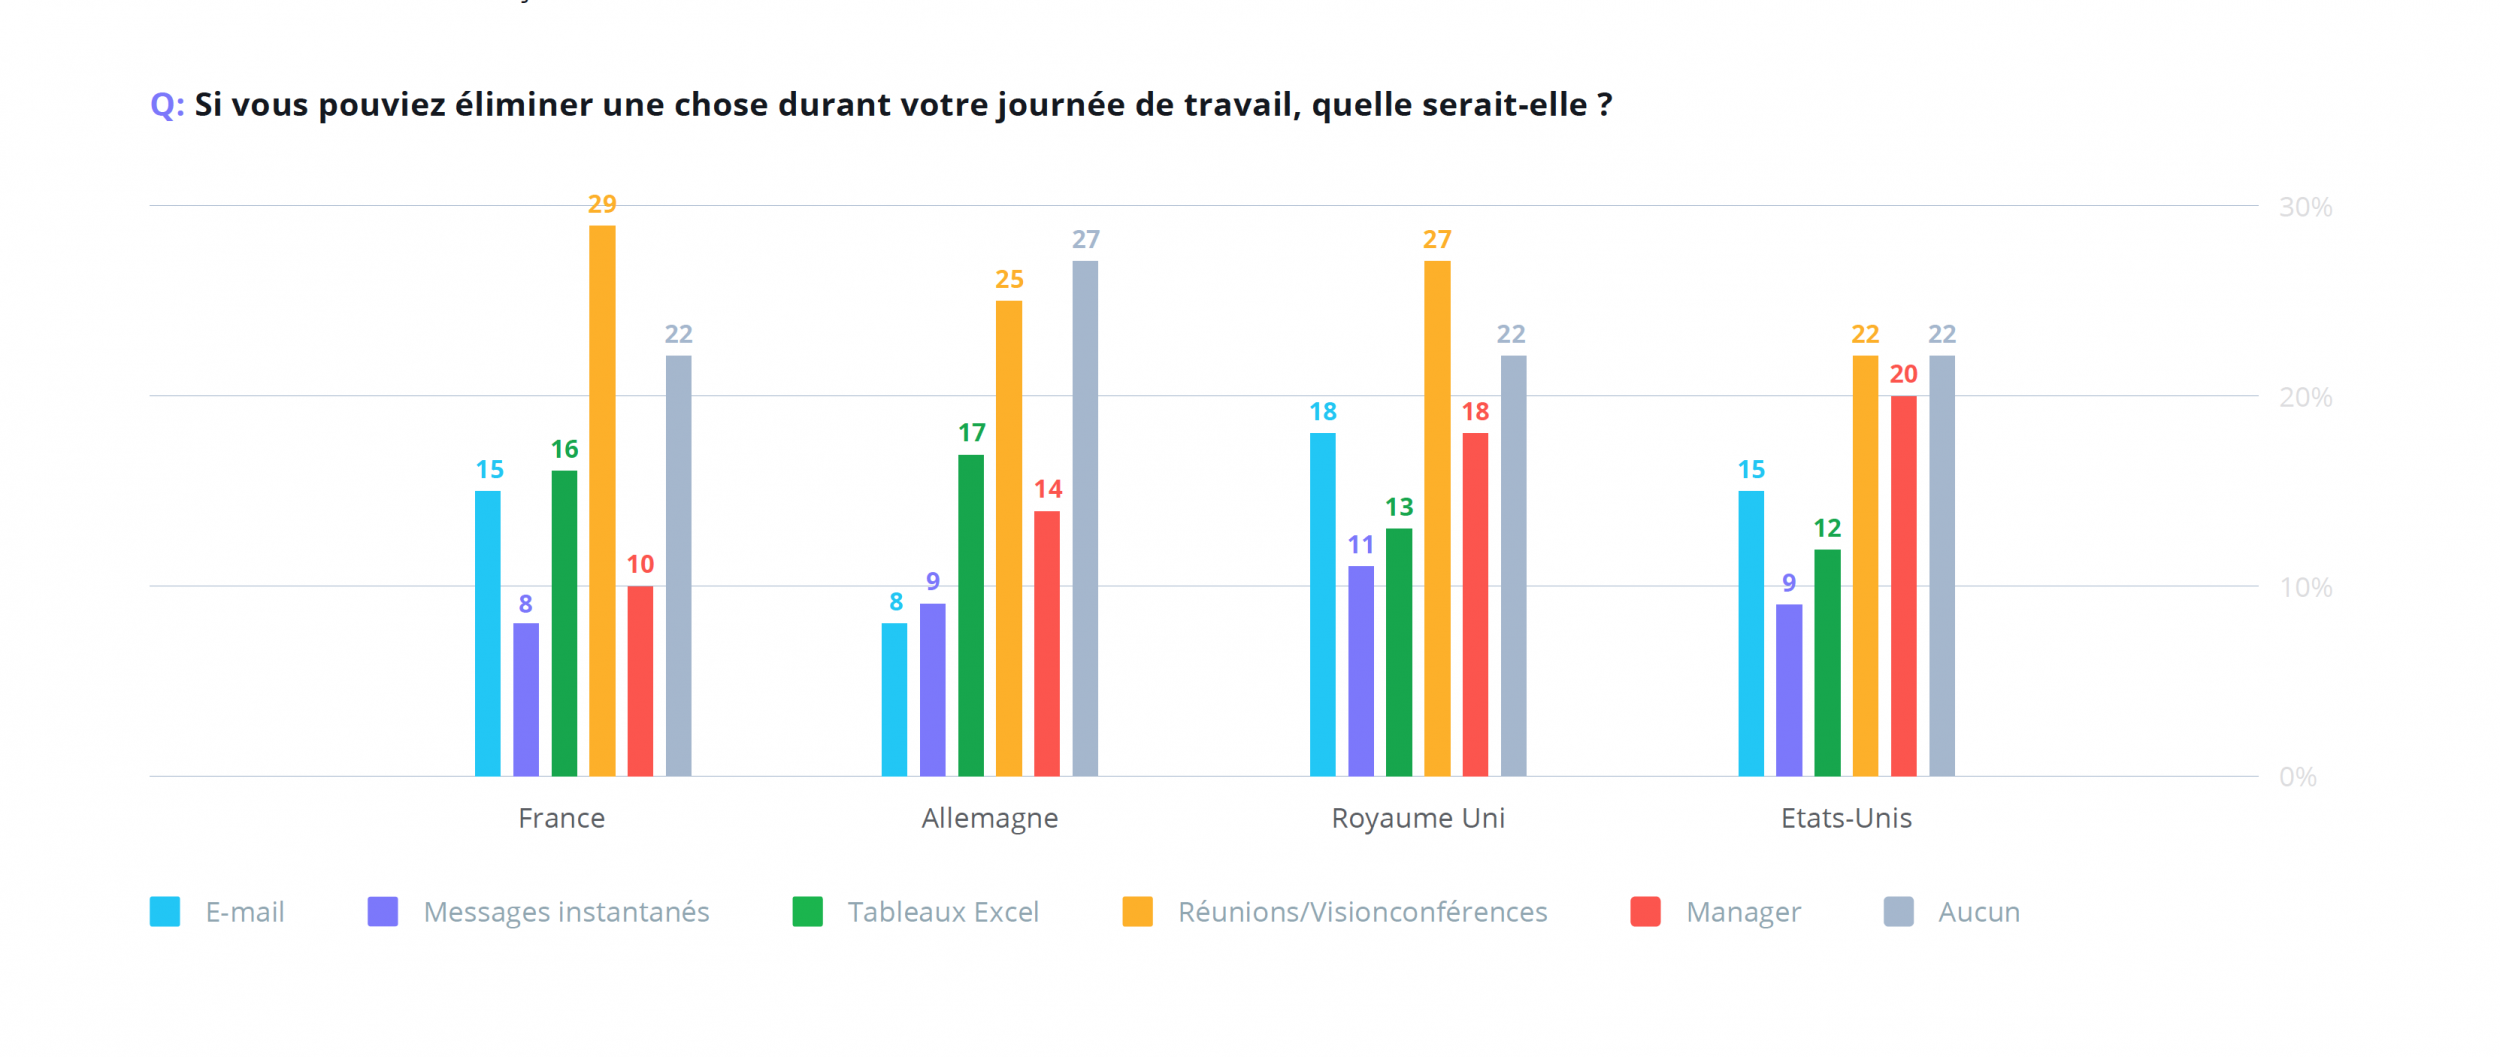 whi-2018-salaries-francais-champions-travail-collaboratif